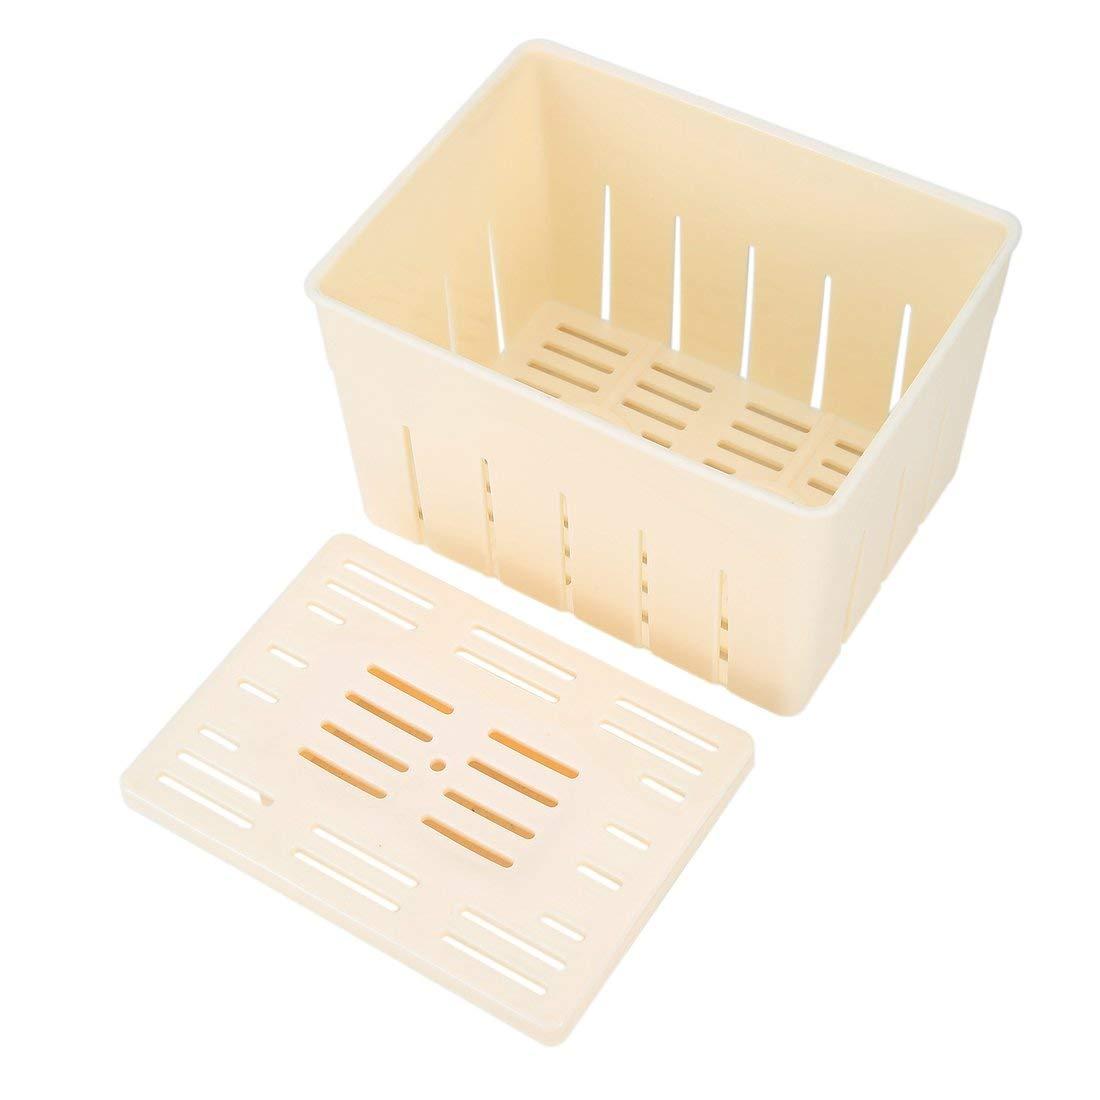 Food-Grade Plastic Tofu Box Tofu Mold Household Tofu Maker DIY Cooking Tool Press-Maker Home Made Healthy Life - White Formulaone